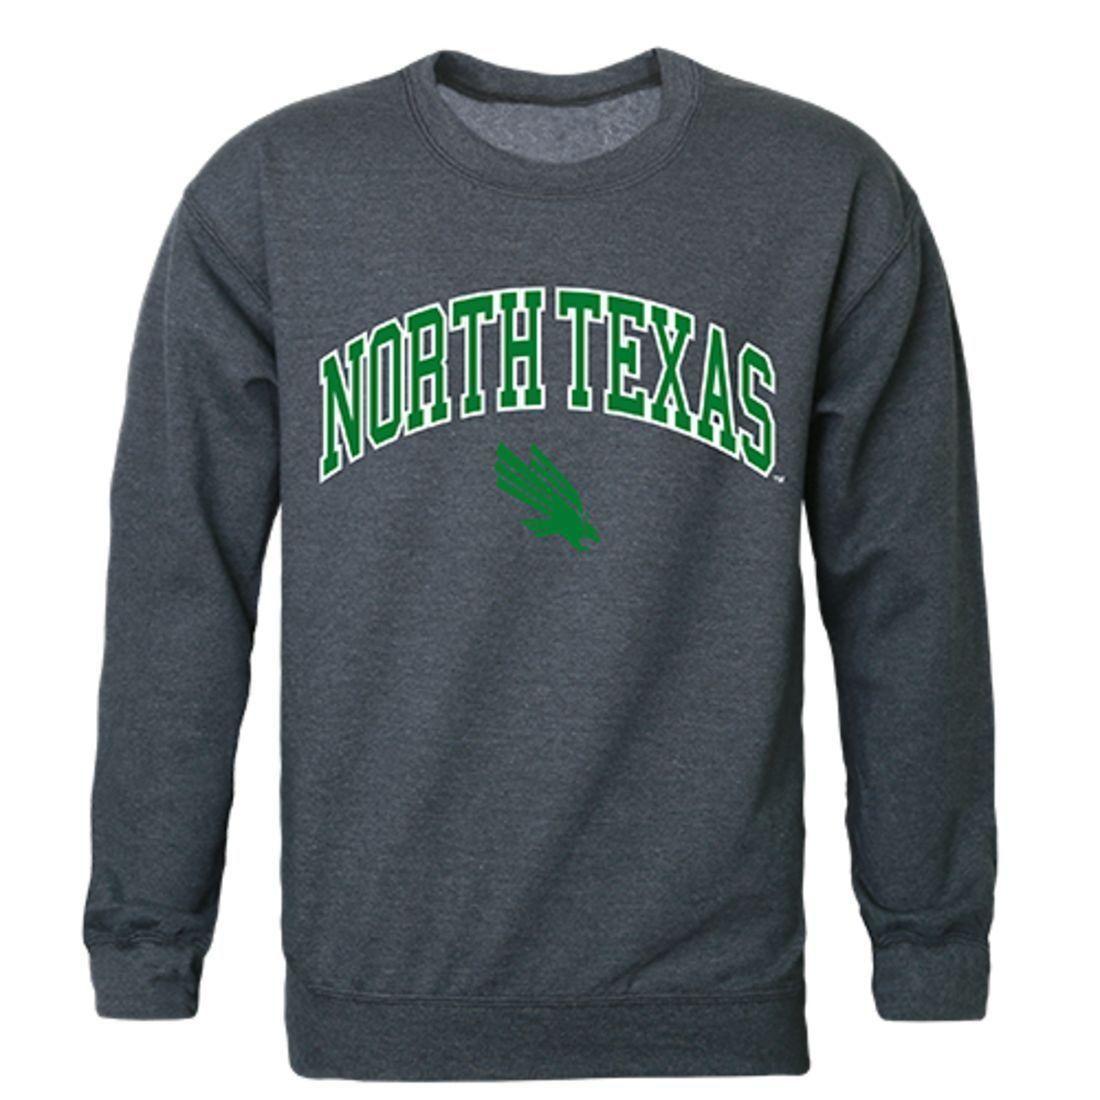 Teedcma Unt University Of North Texas Campus Crewneck Pullover Sweatshirt Sweater Heather Charcoal Gift For Sweatshirt Sweater Sweatshirts Pullover Sweatshirt [ 1100 x 1100 Pixel ]